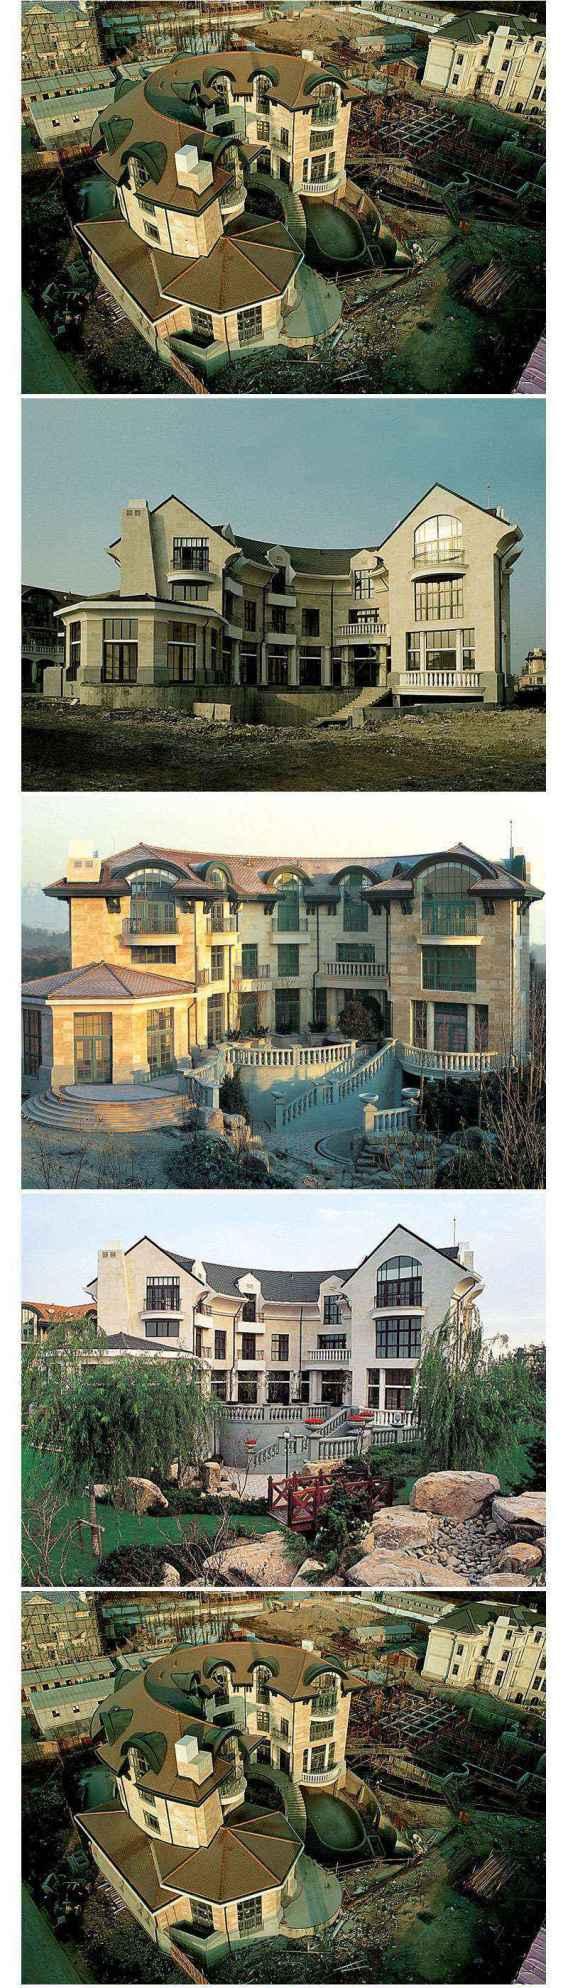 ★【Villa CAD Design,Details Project V.4-England Manor Style】Chateau,Manor,Mansion,Villa@Autocad Blocks,Drawings,CAD Details,Elevation